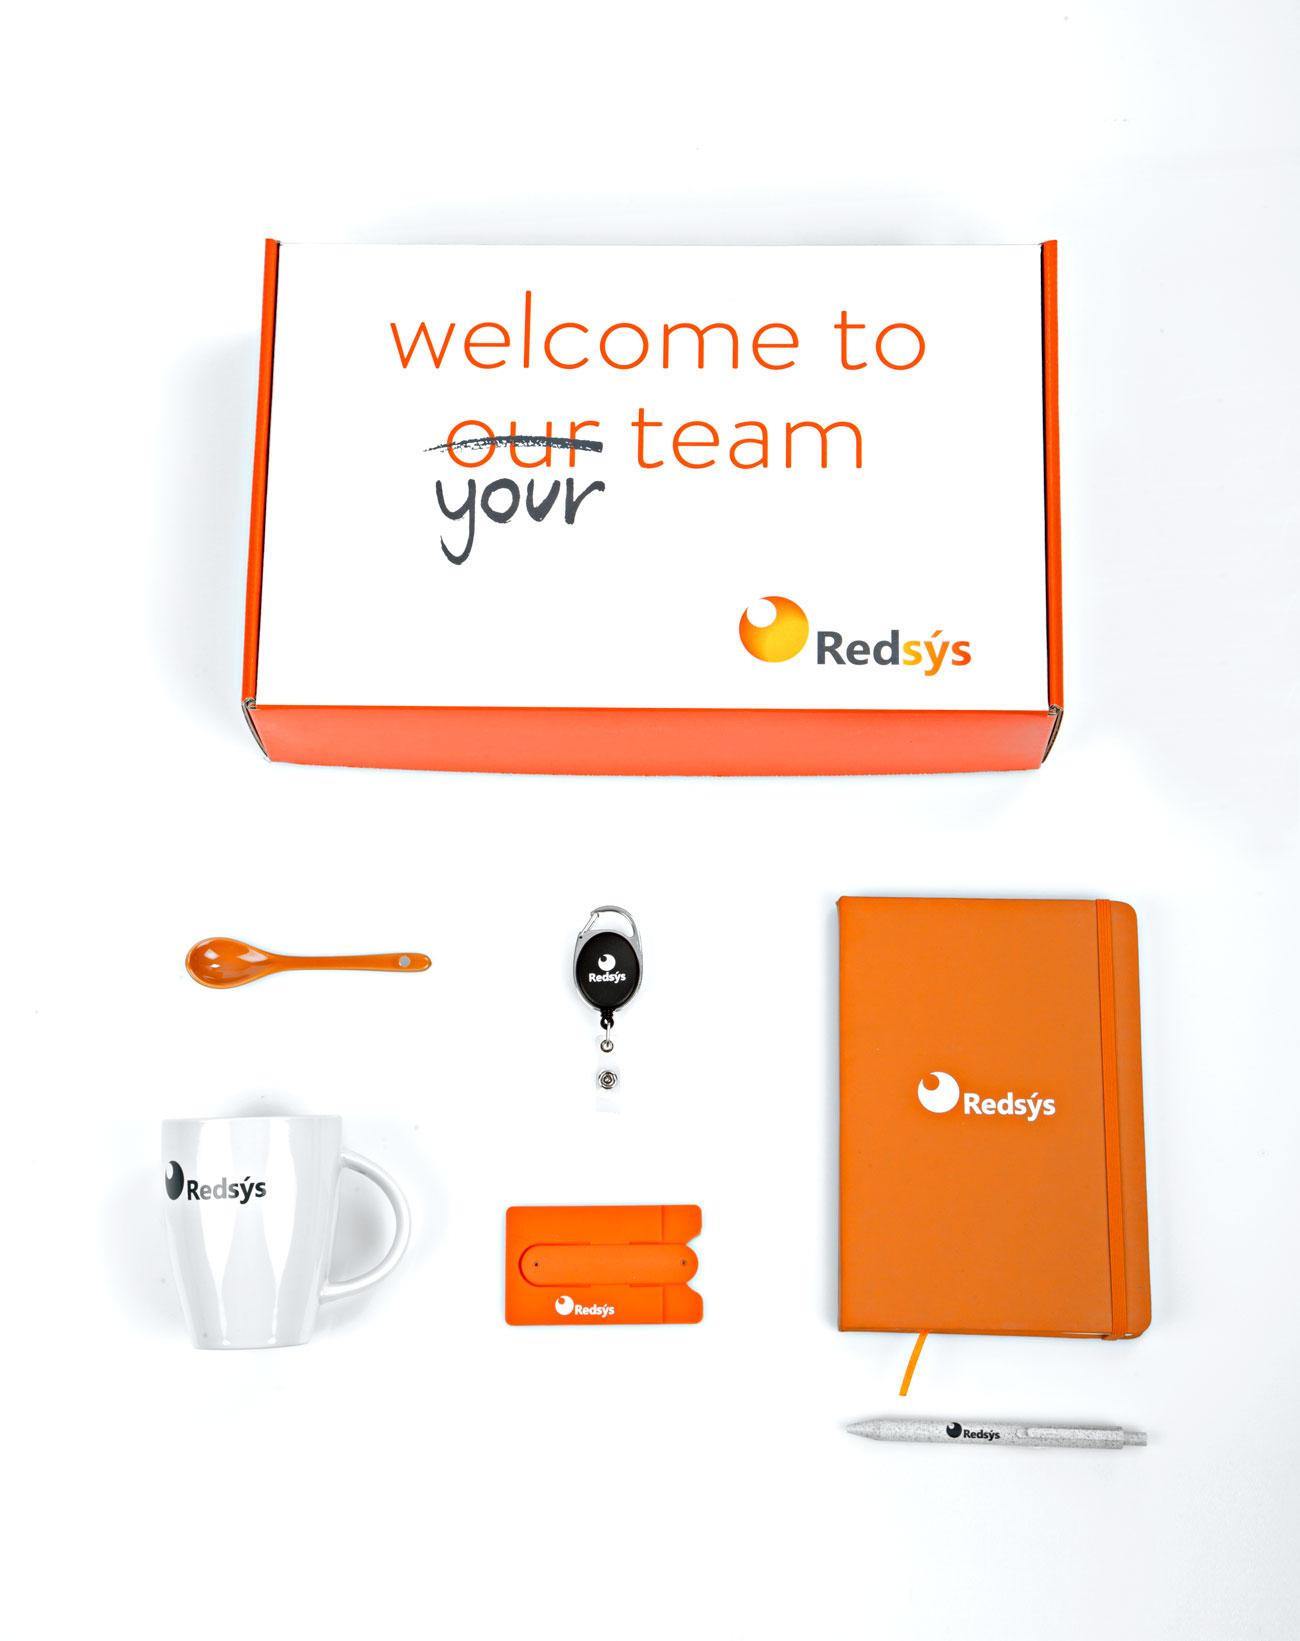 ugedafita redsys welcome pack 6 1